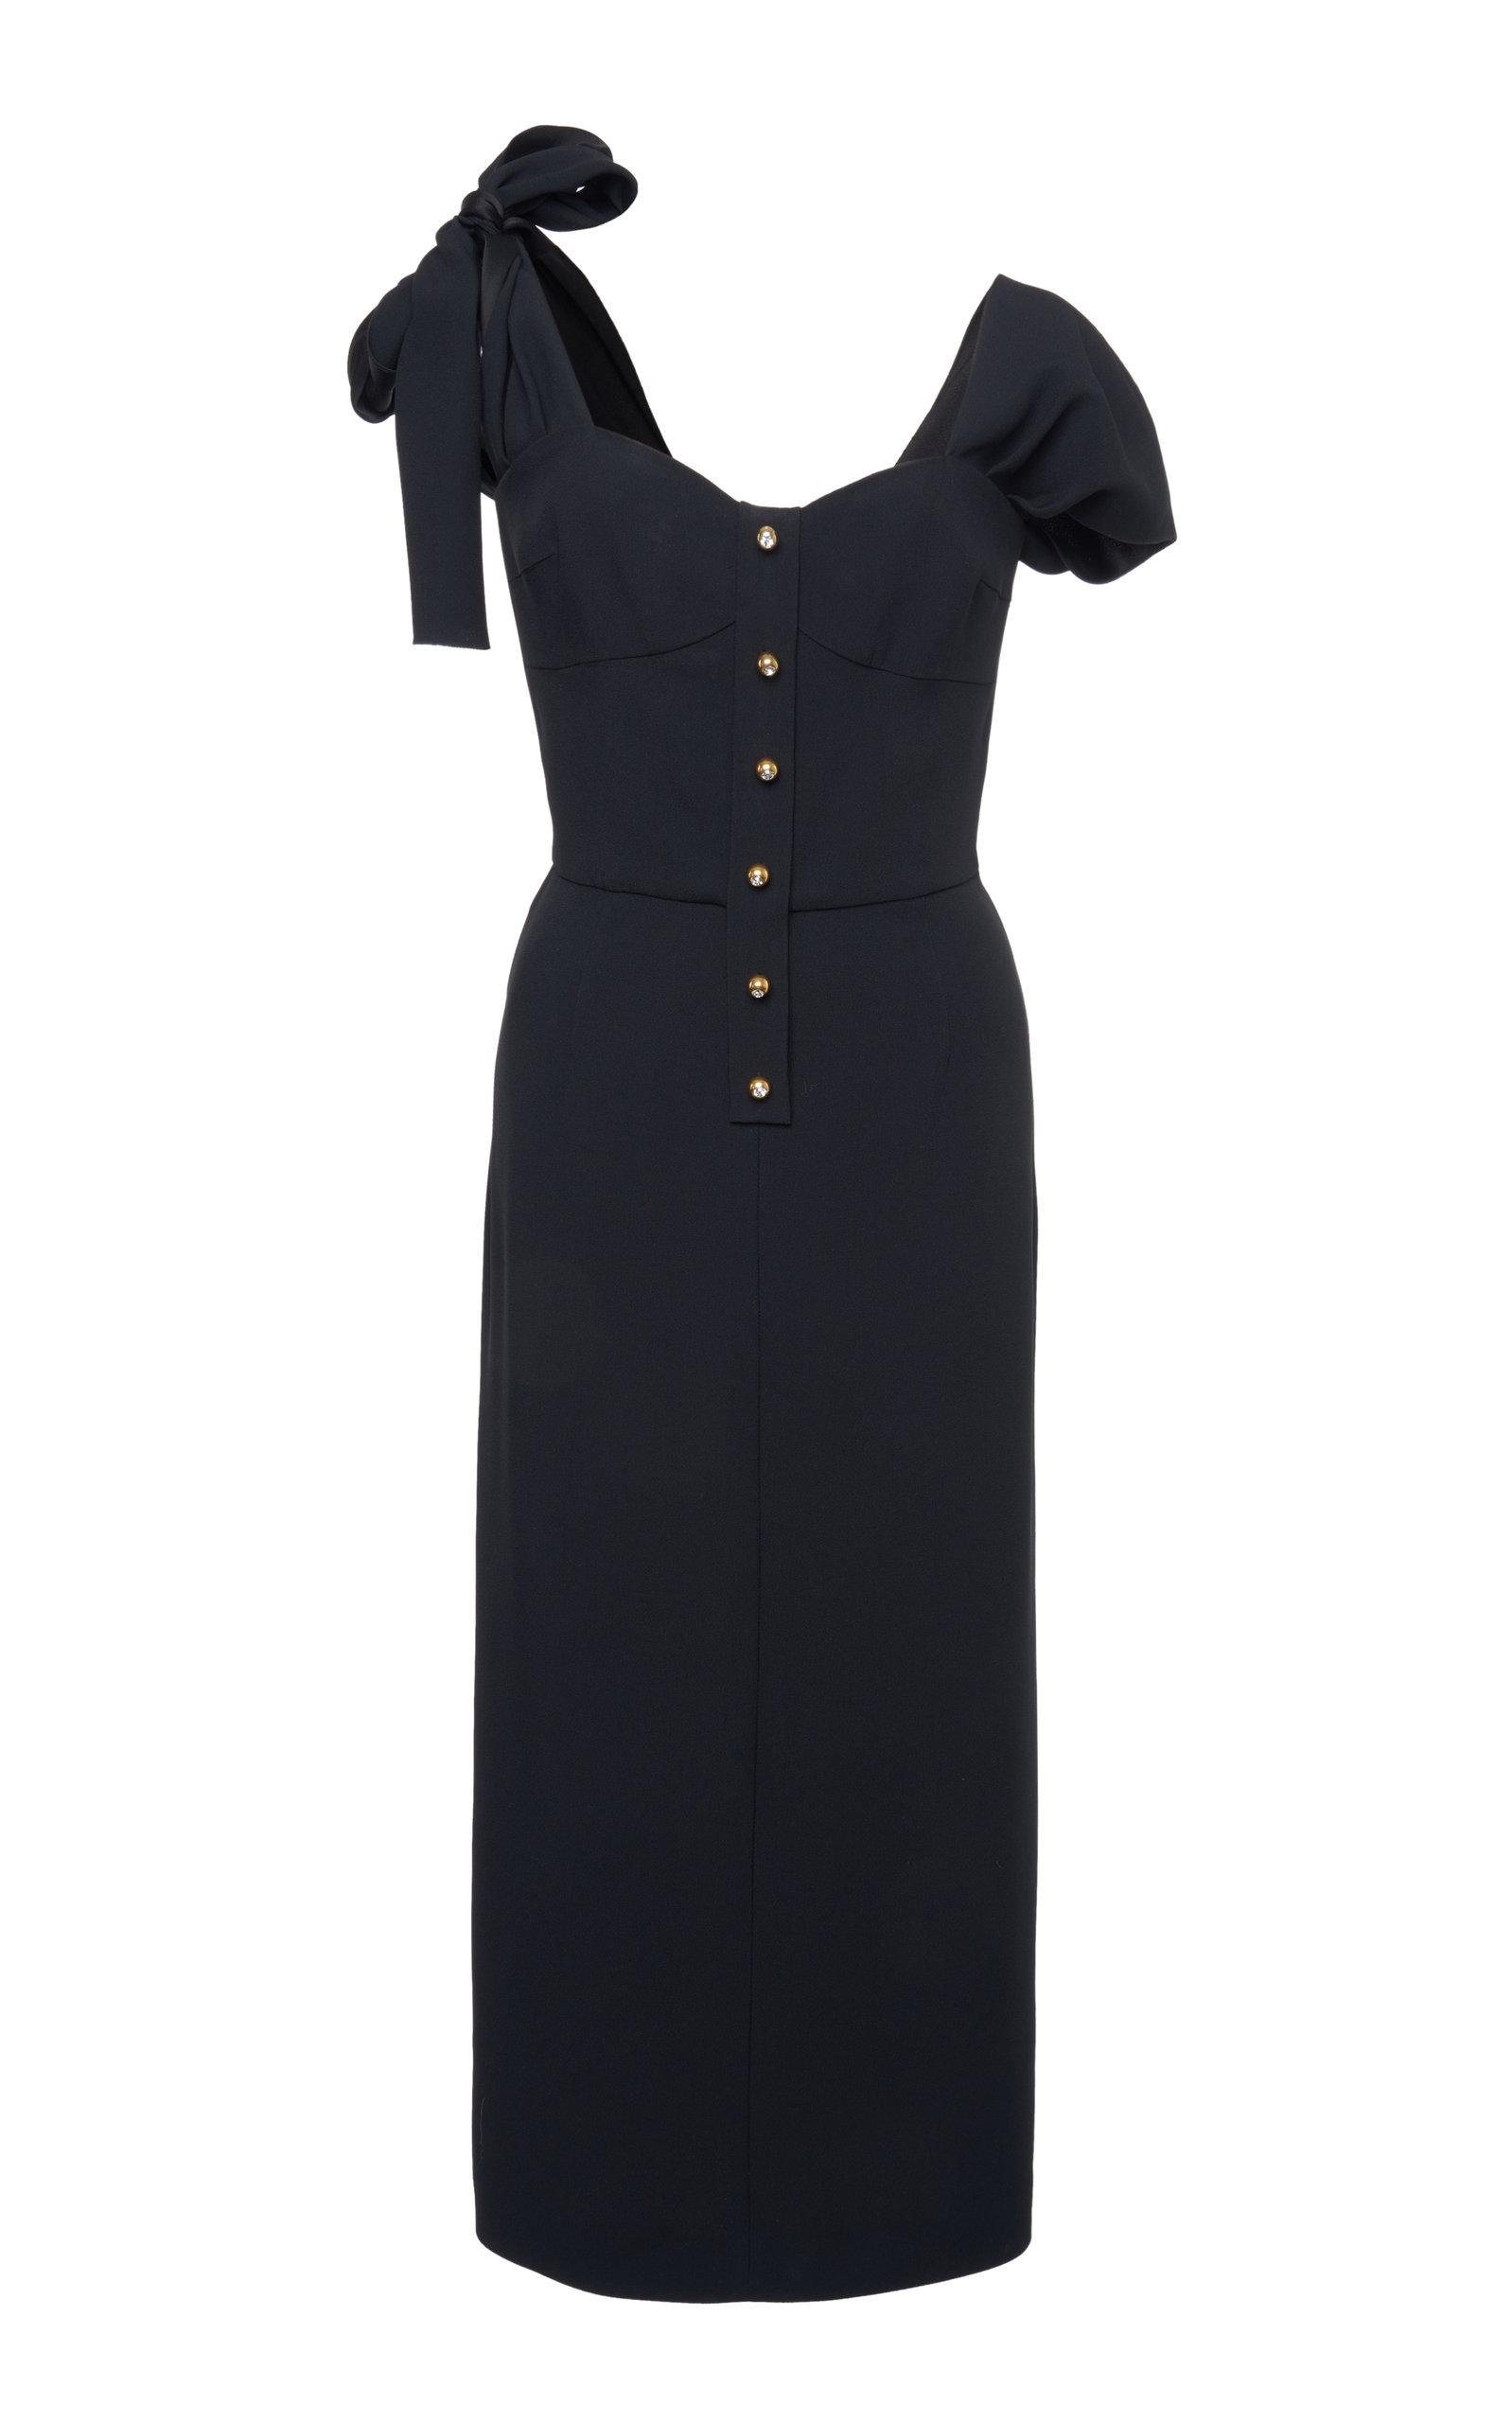 Buy Prada Tie-Detailed Satin-Crepe Midi Dress online, shop Prada at the best price